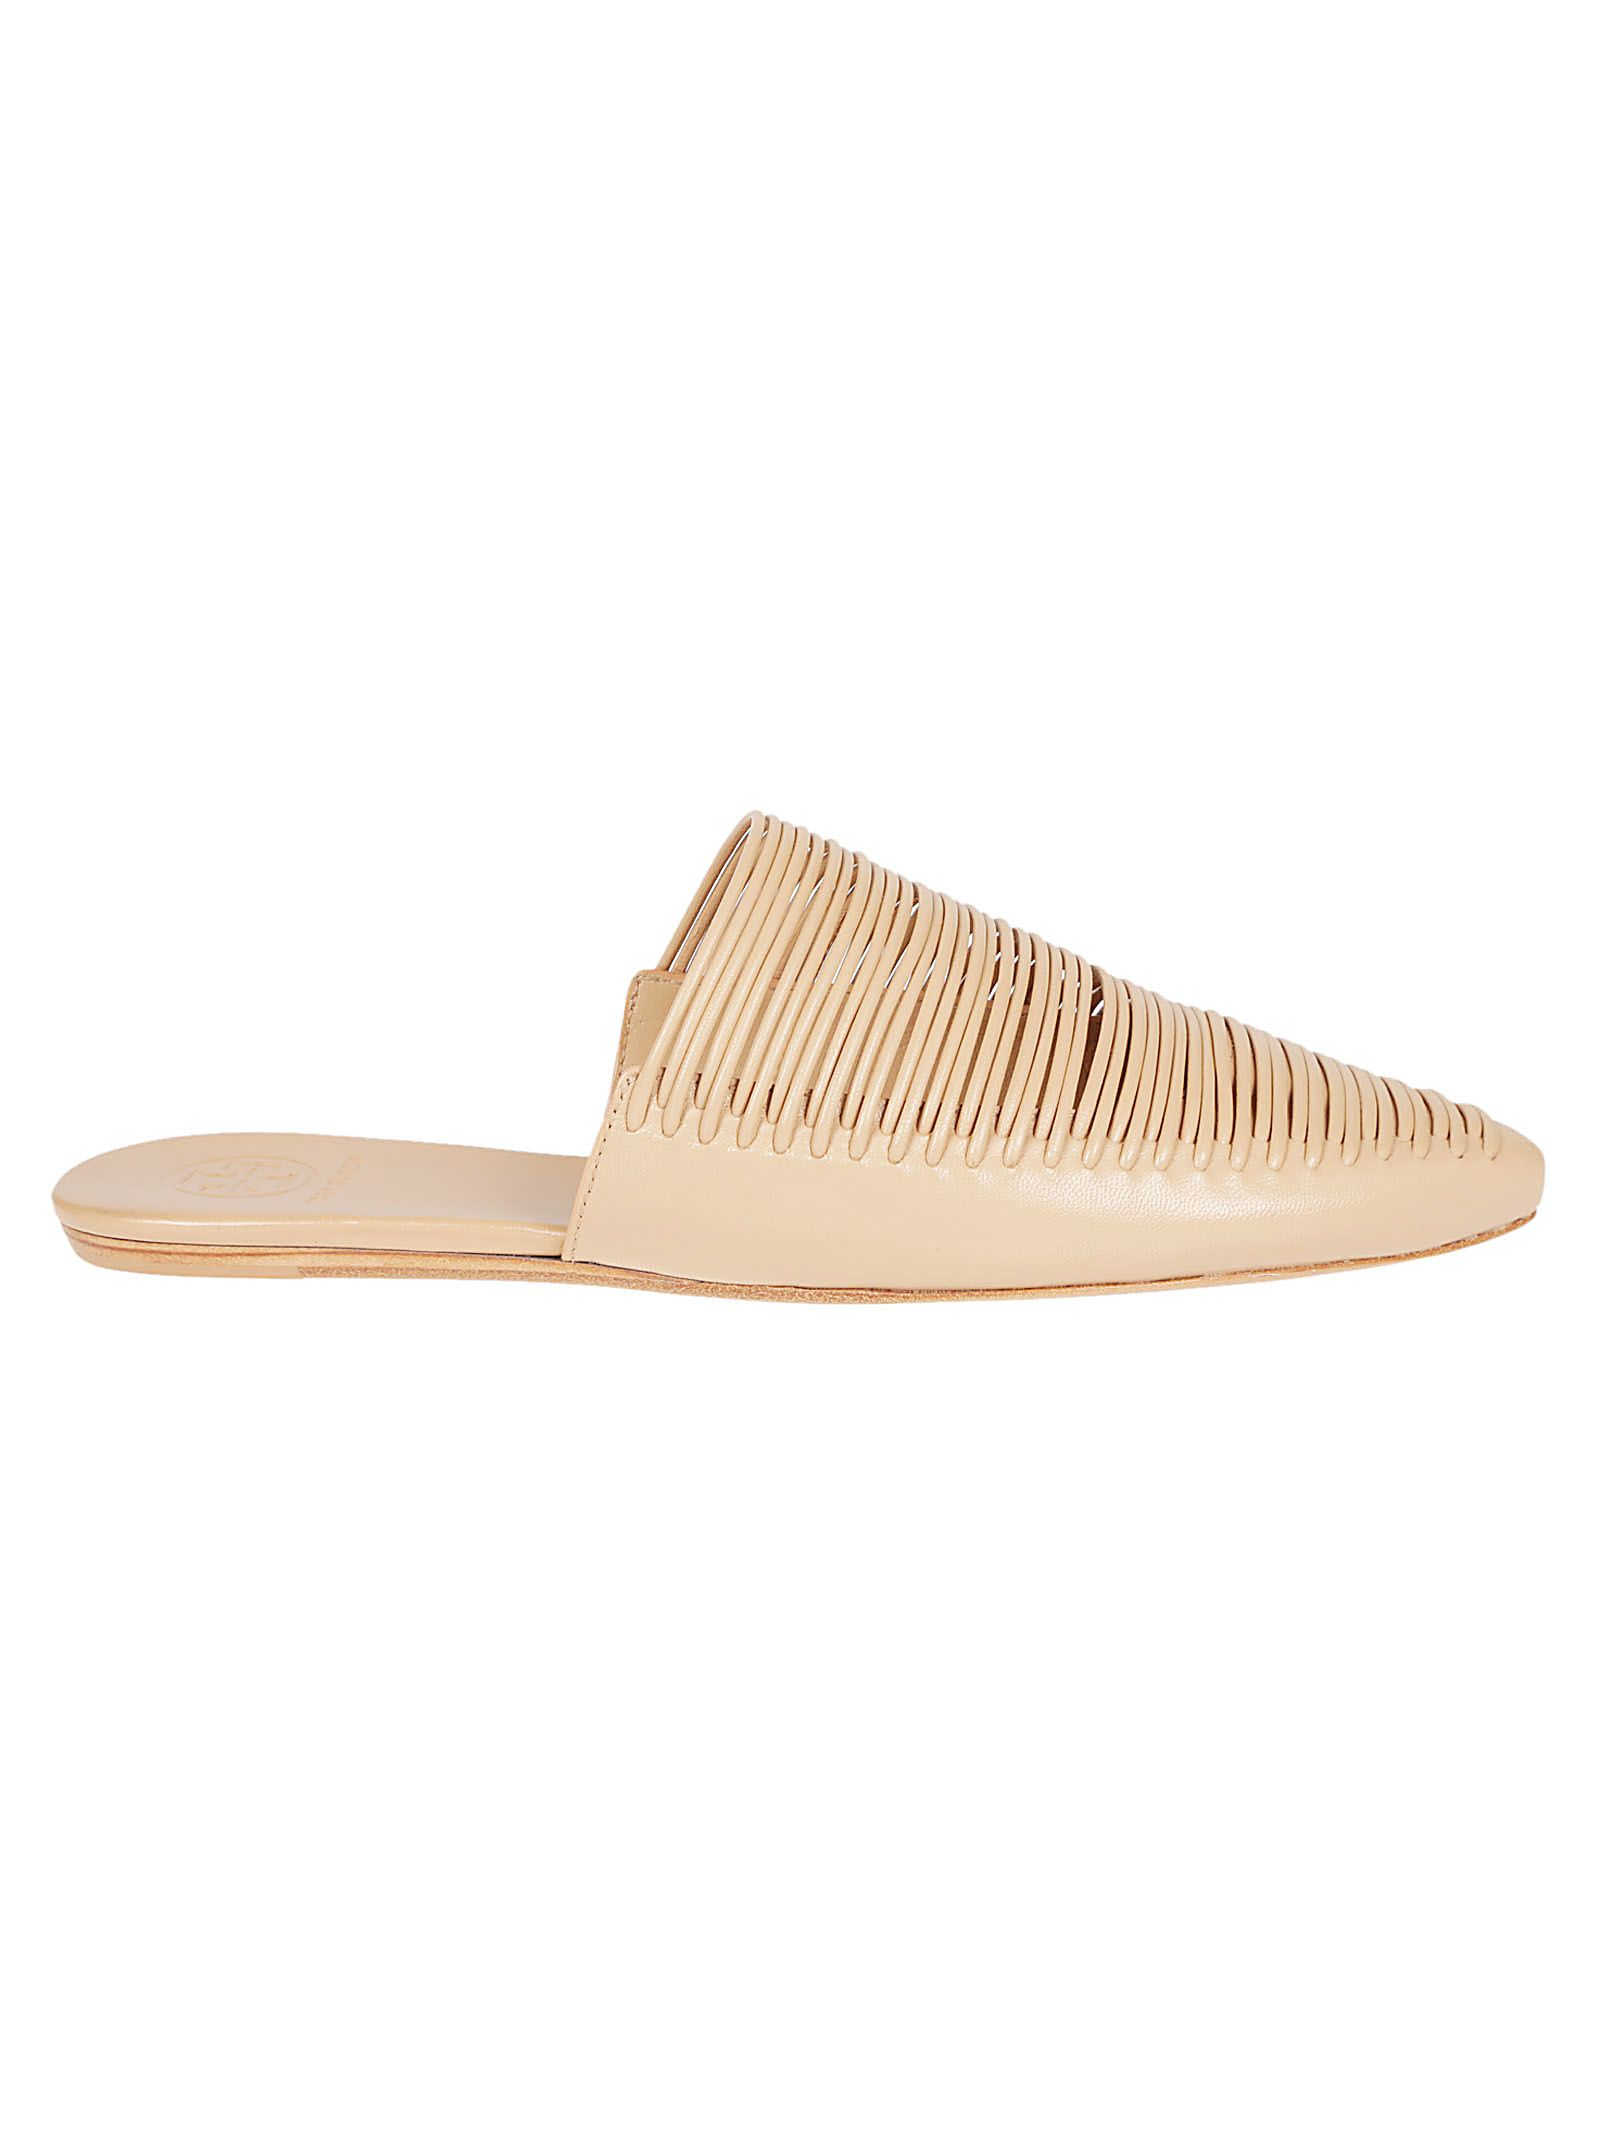 42cb9eb1e51 Tory Burch Tory Burch Sienna Flat Sandals - Natural Vachetta ...